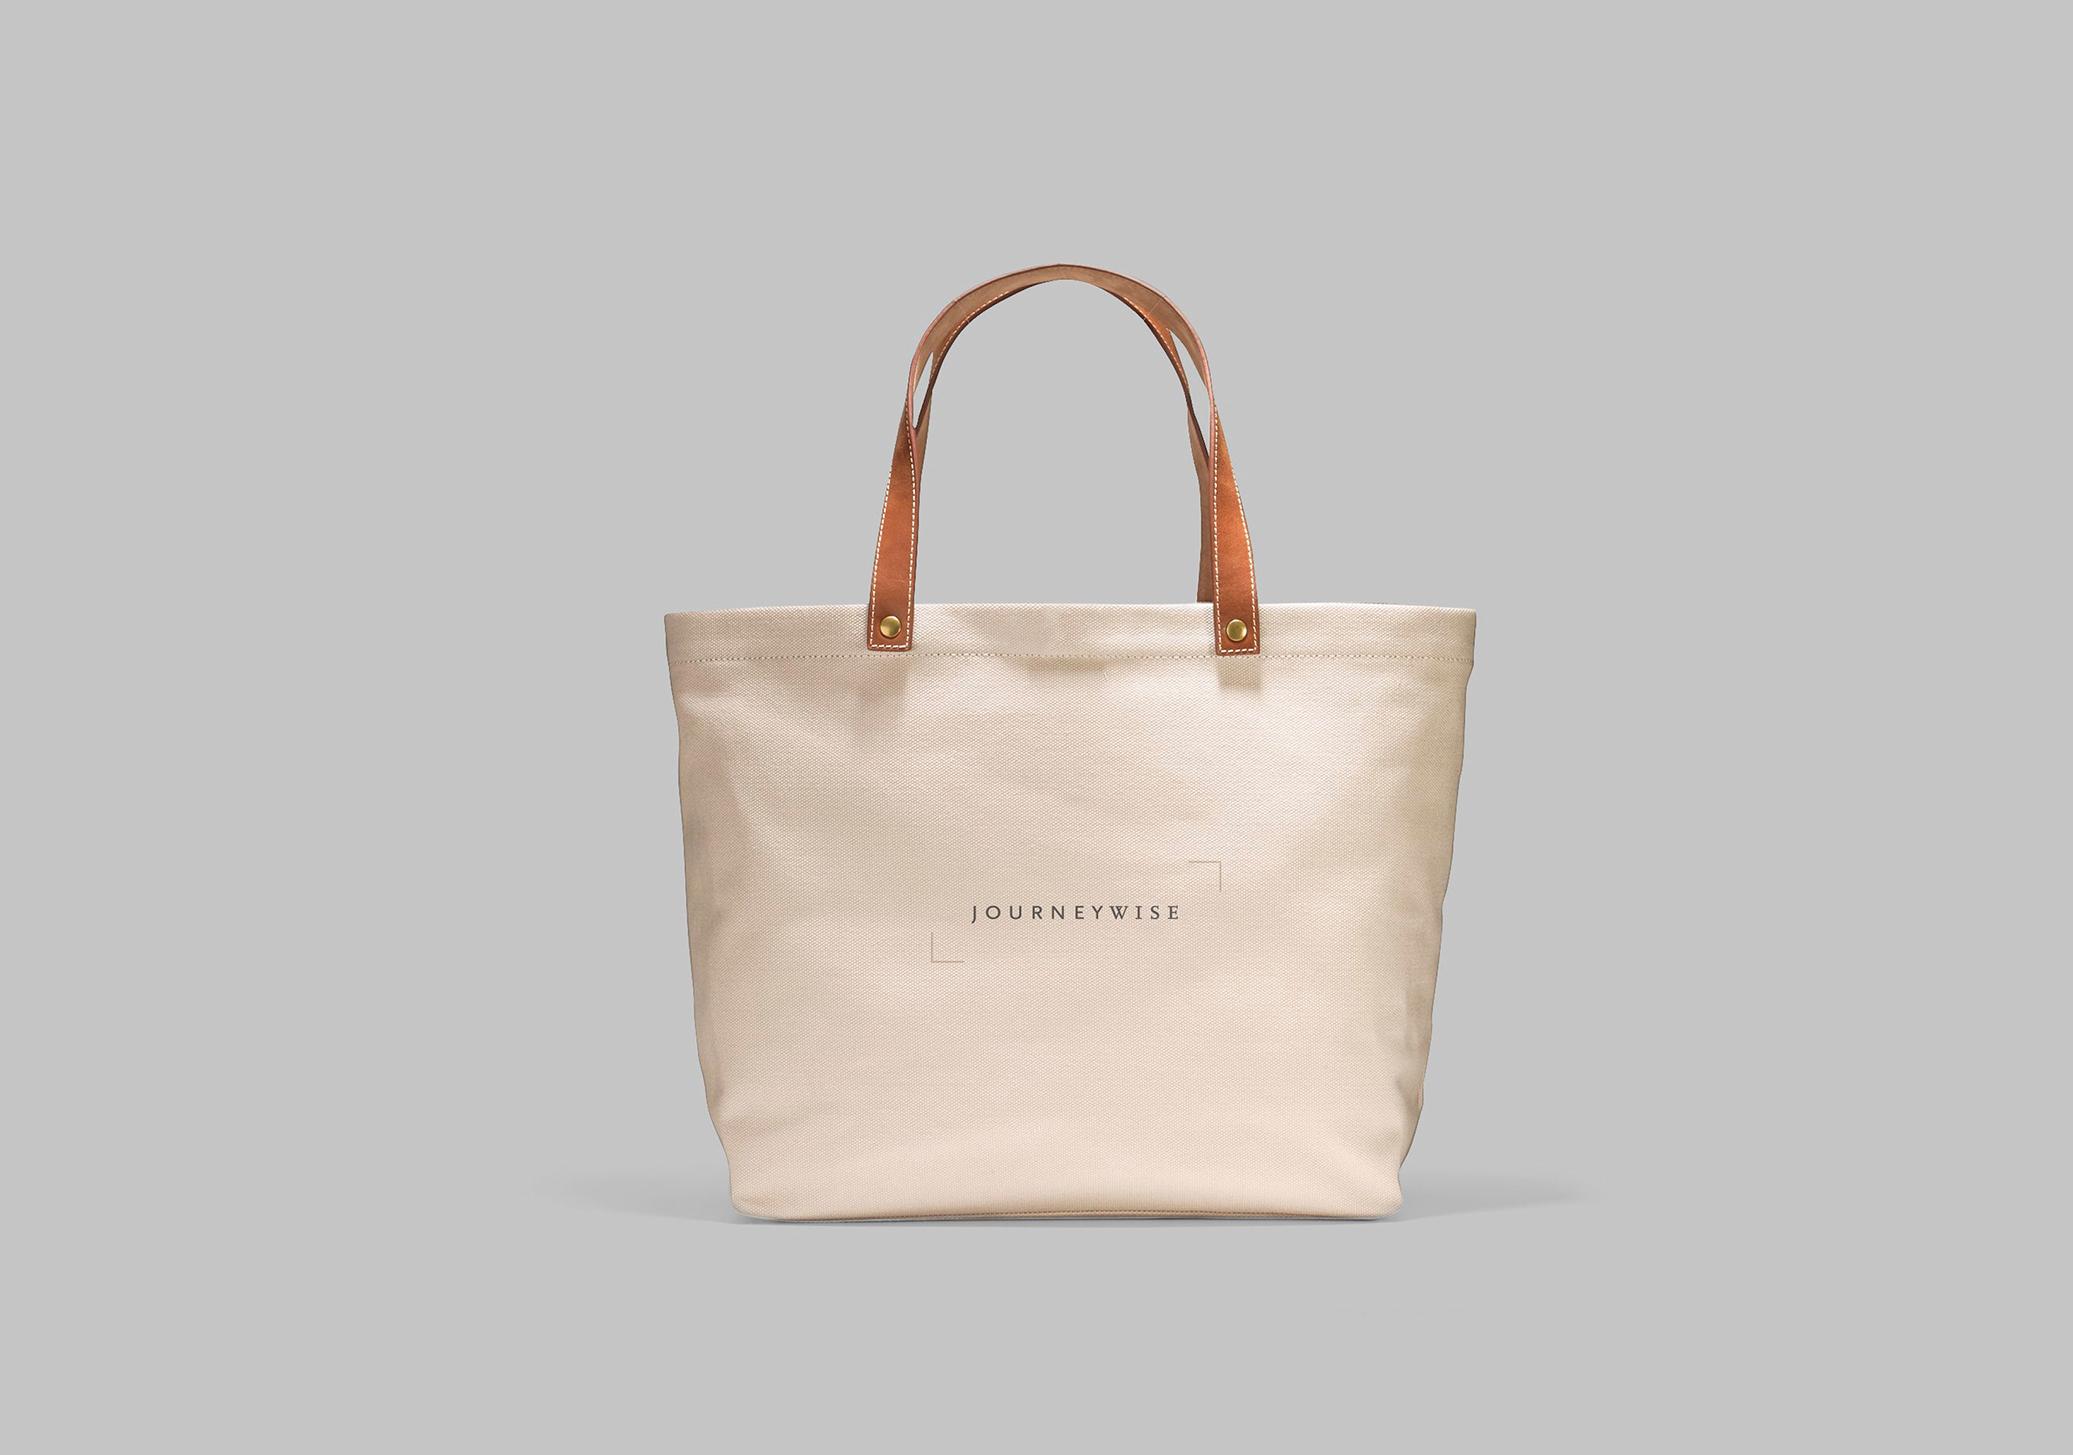 Journeywise Tote Bag Design